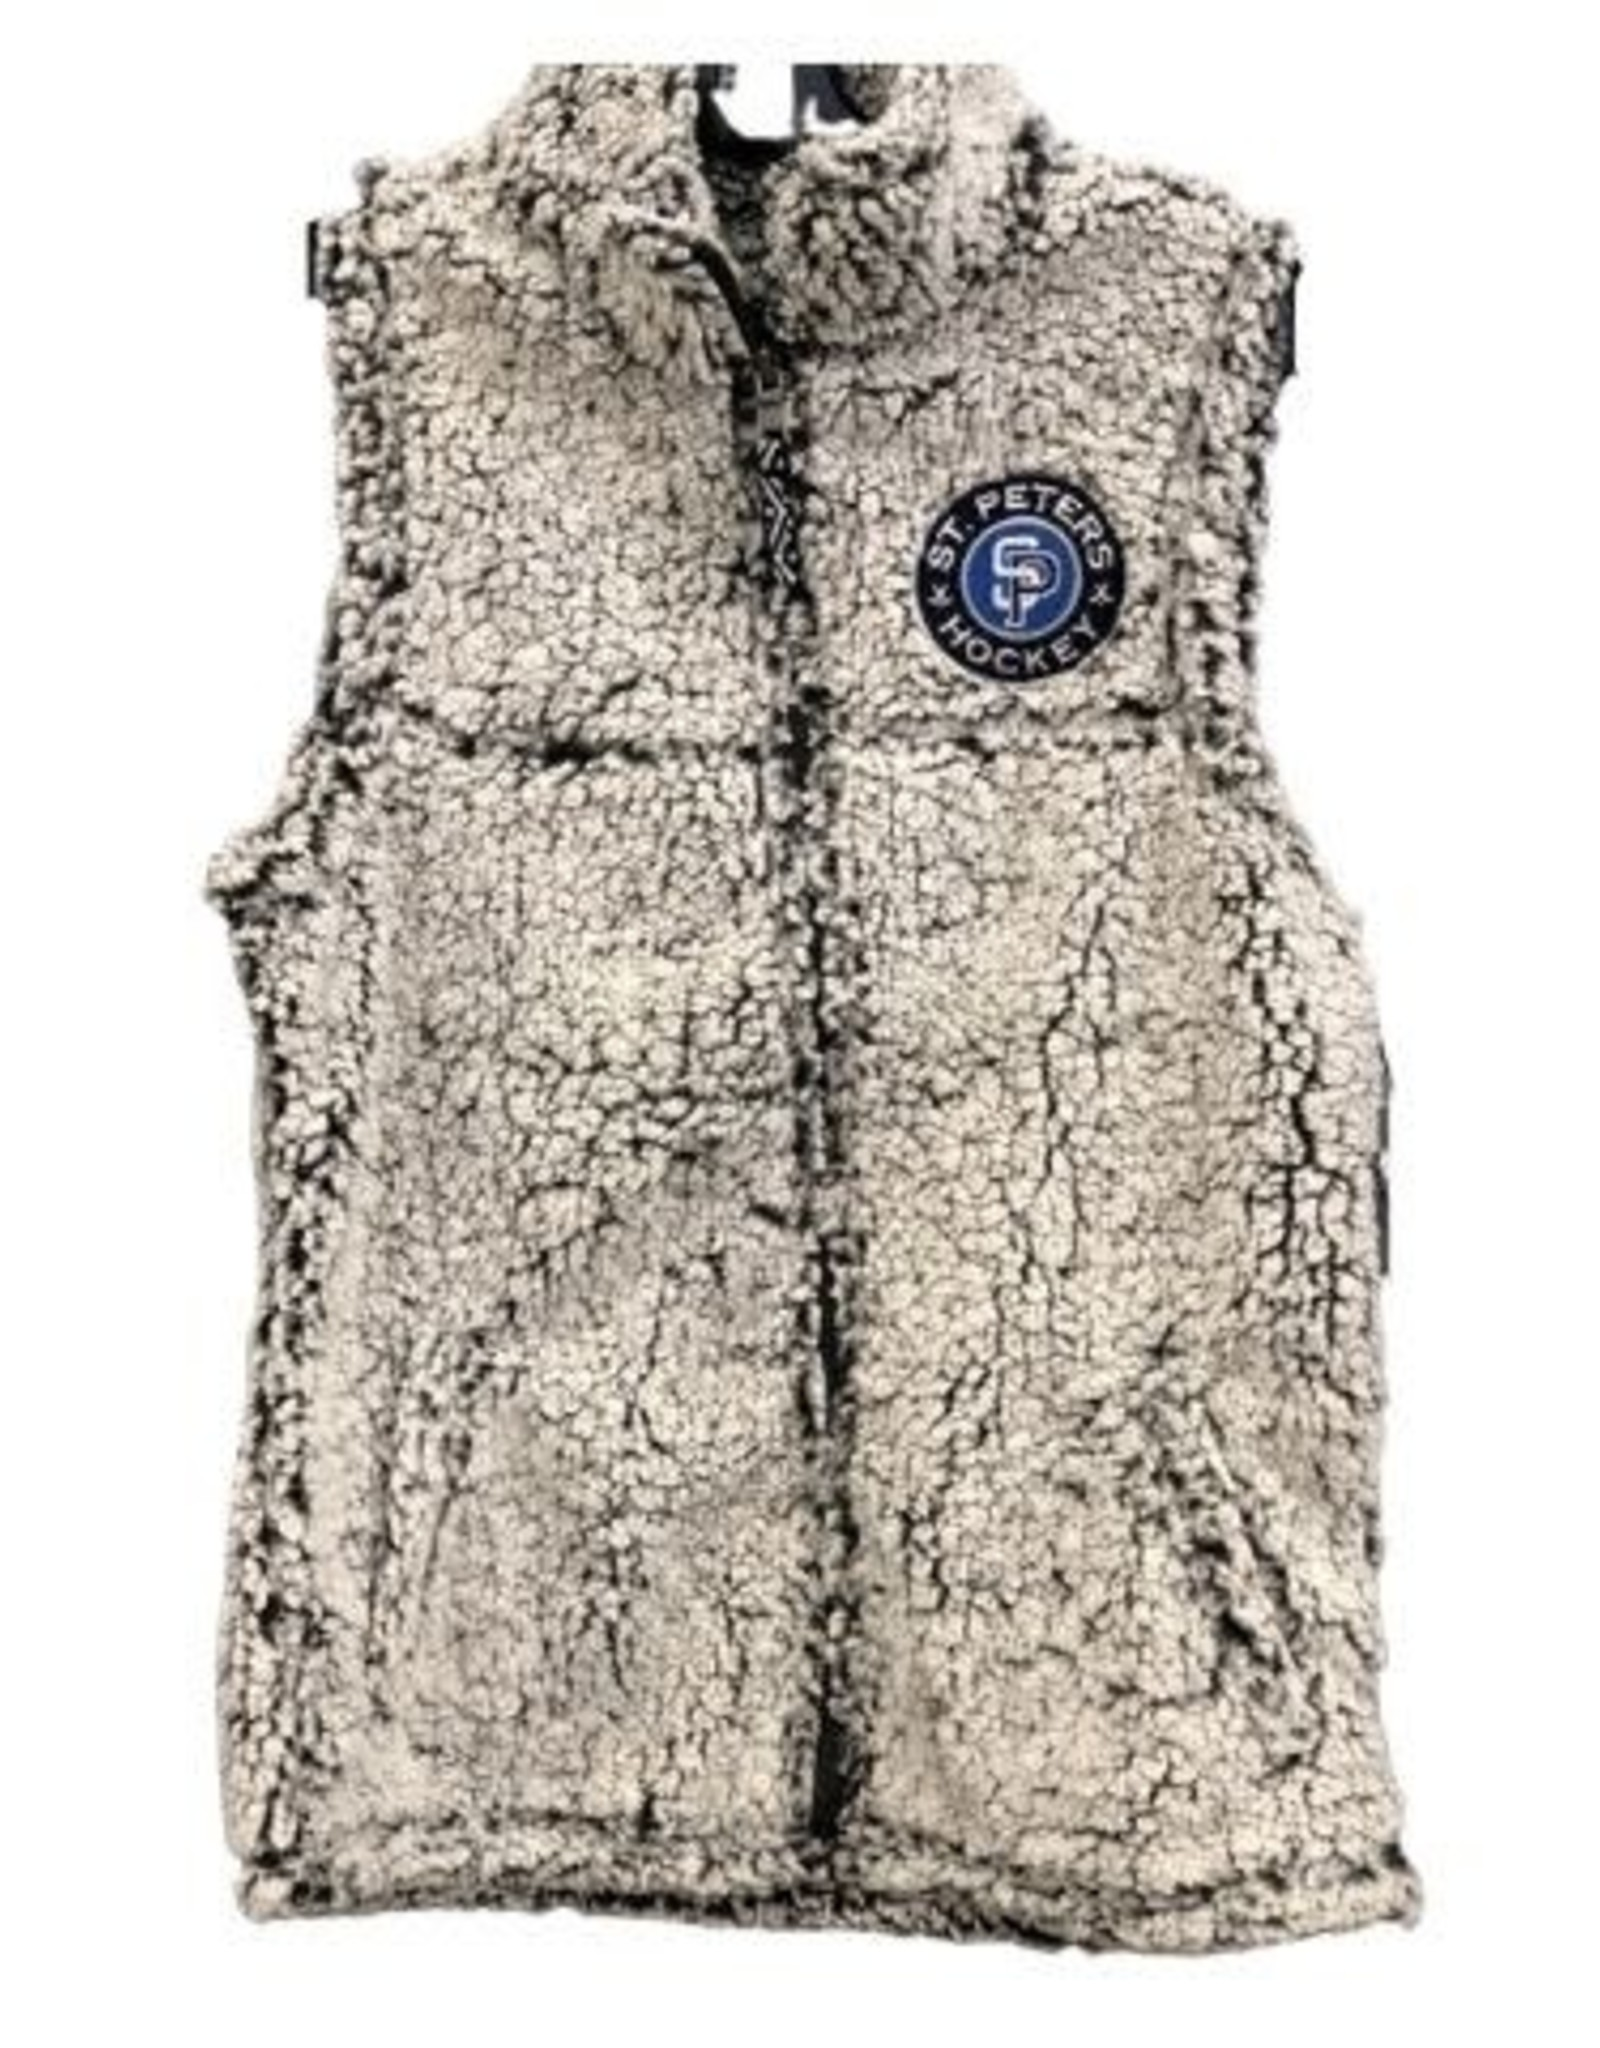 TGP Services STP Sherpa Vest (ADULT)